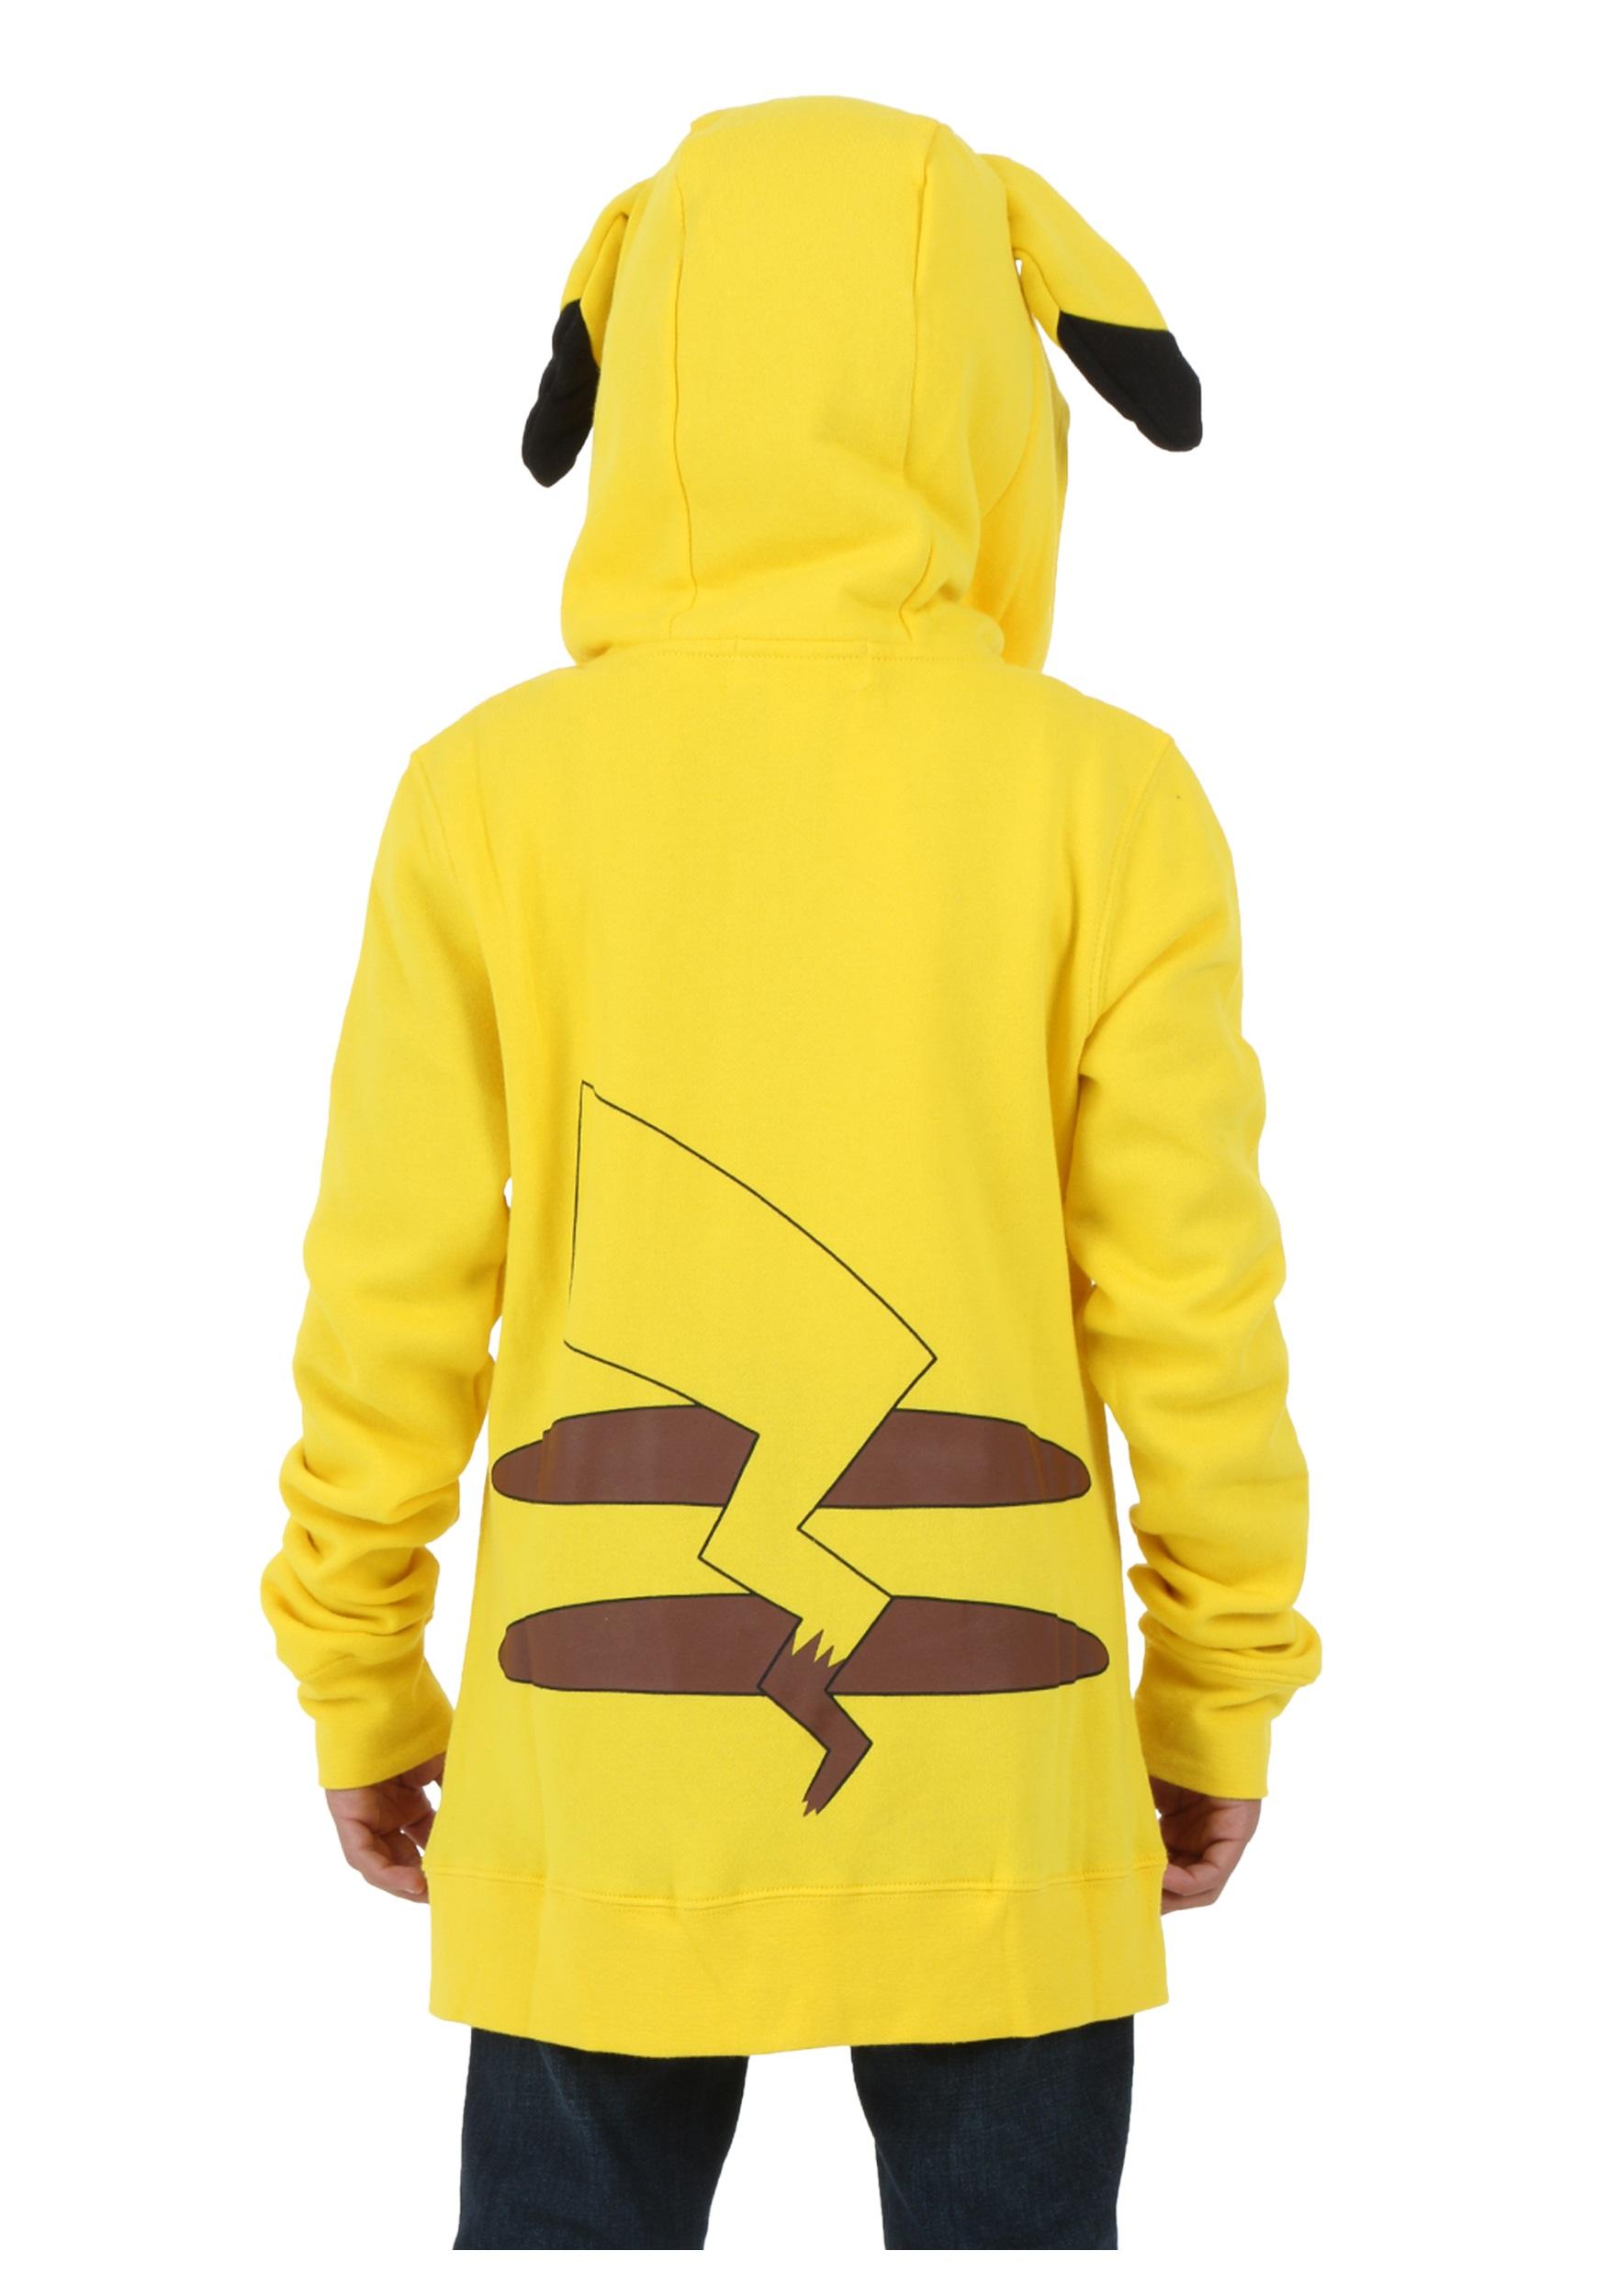 Womens Pikachu Hoodie · Womens Pikachu Hoodie